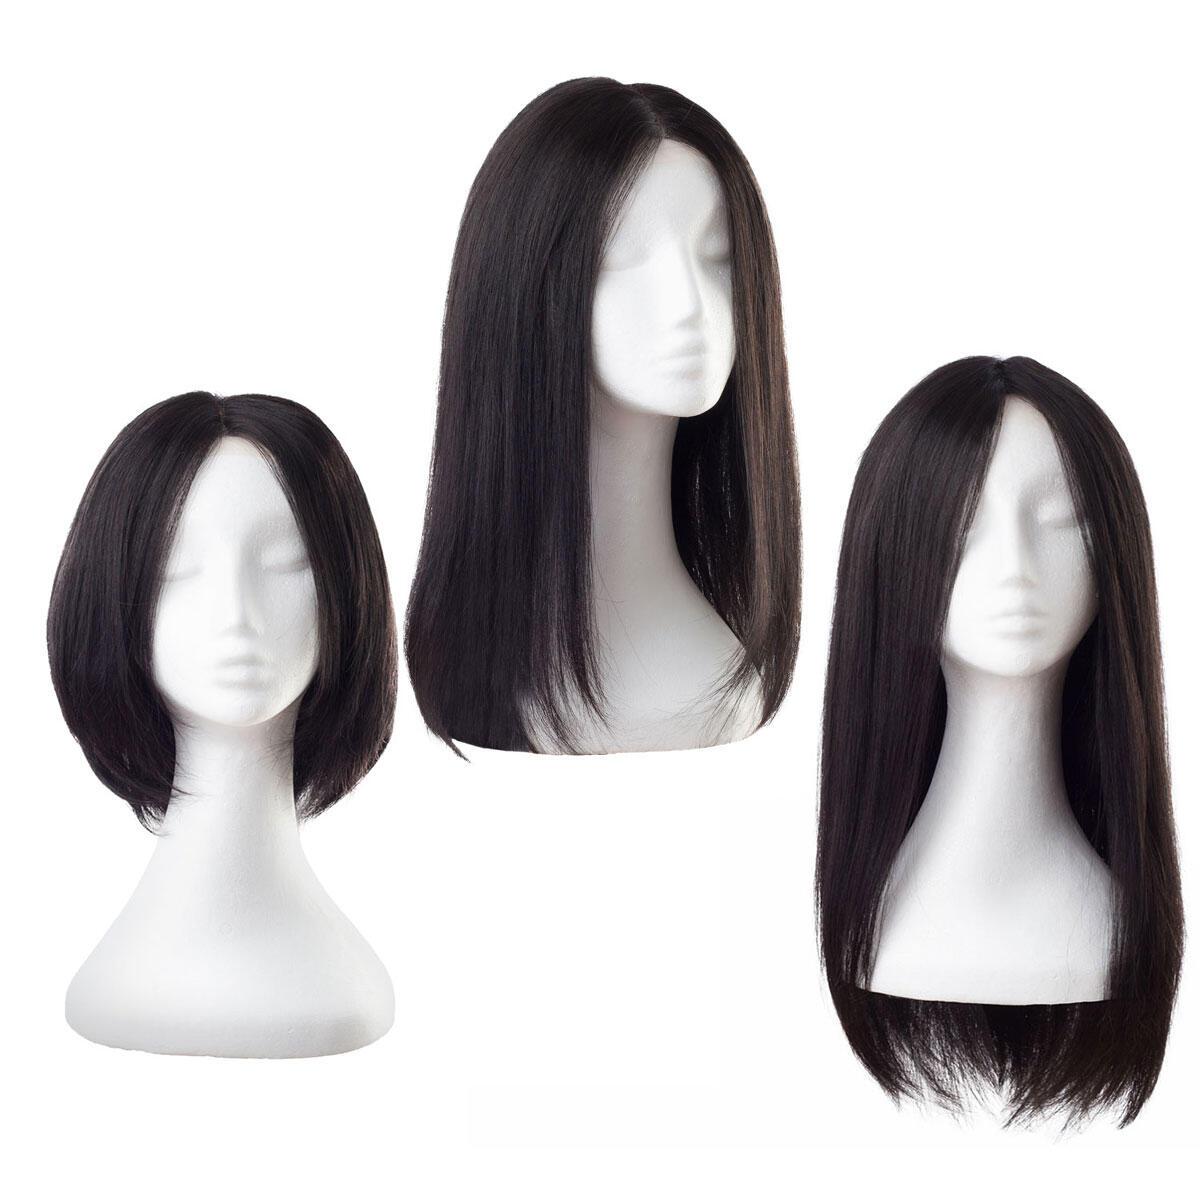 Lace Wig Human Hair 1.1 Intense Black 45 cm